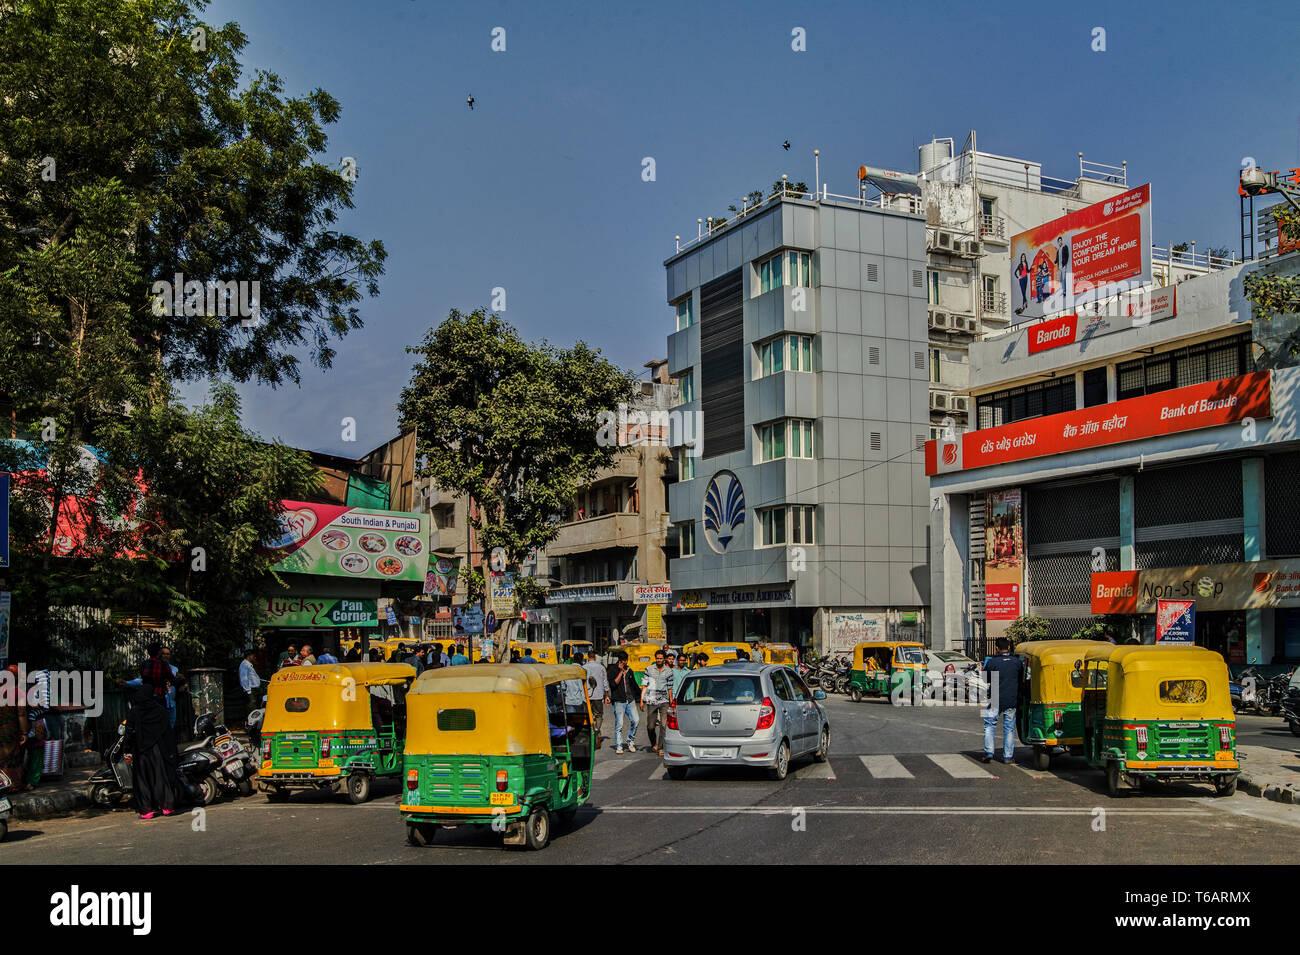 16—Jan-2017-Hotel Grand Ambience- Lal Darwaja, Opp. Dinbai Tower, Ahmedabad, Gujarat 380001-GUJARAT INDIA - Stock Image